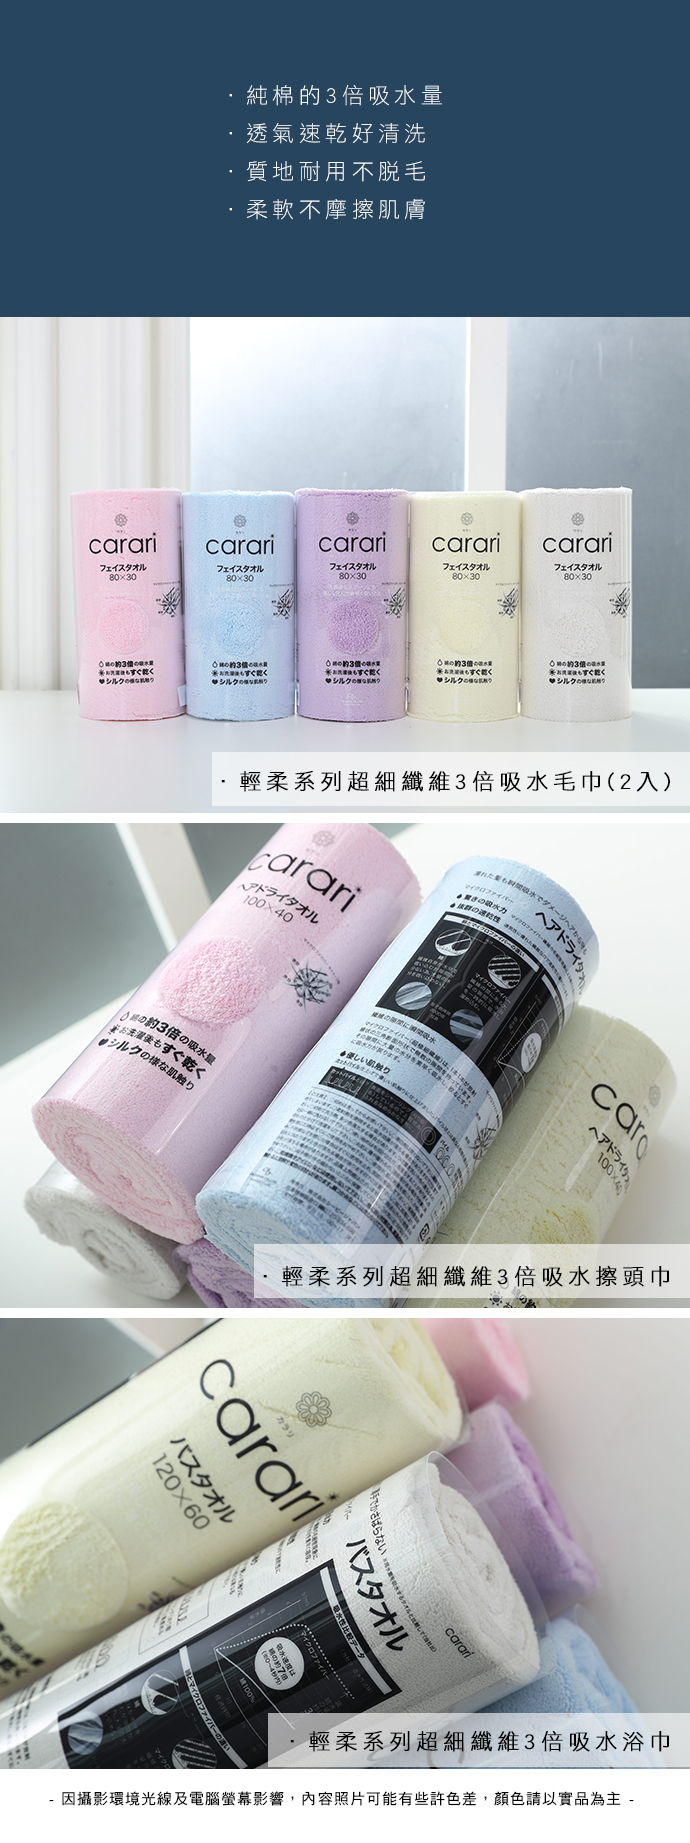 CB Japan|輕柔系列超細纖維3倍吸水毛巾 (2入) - 甜心白